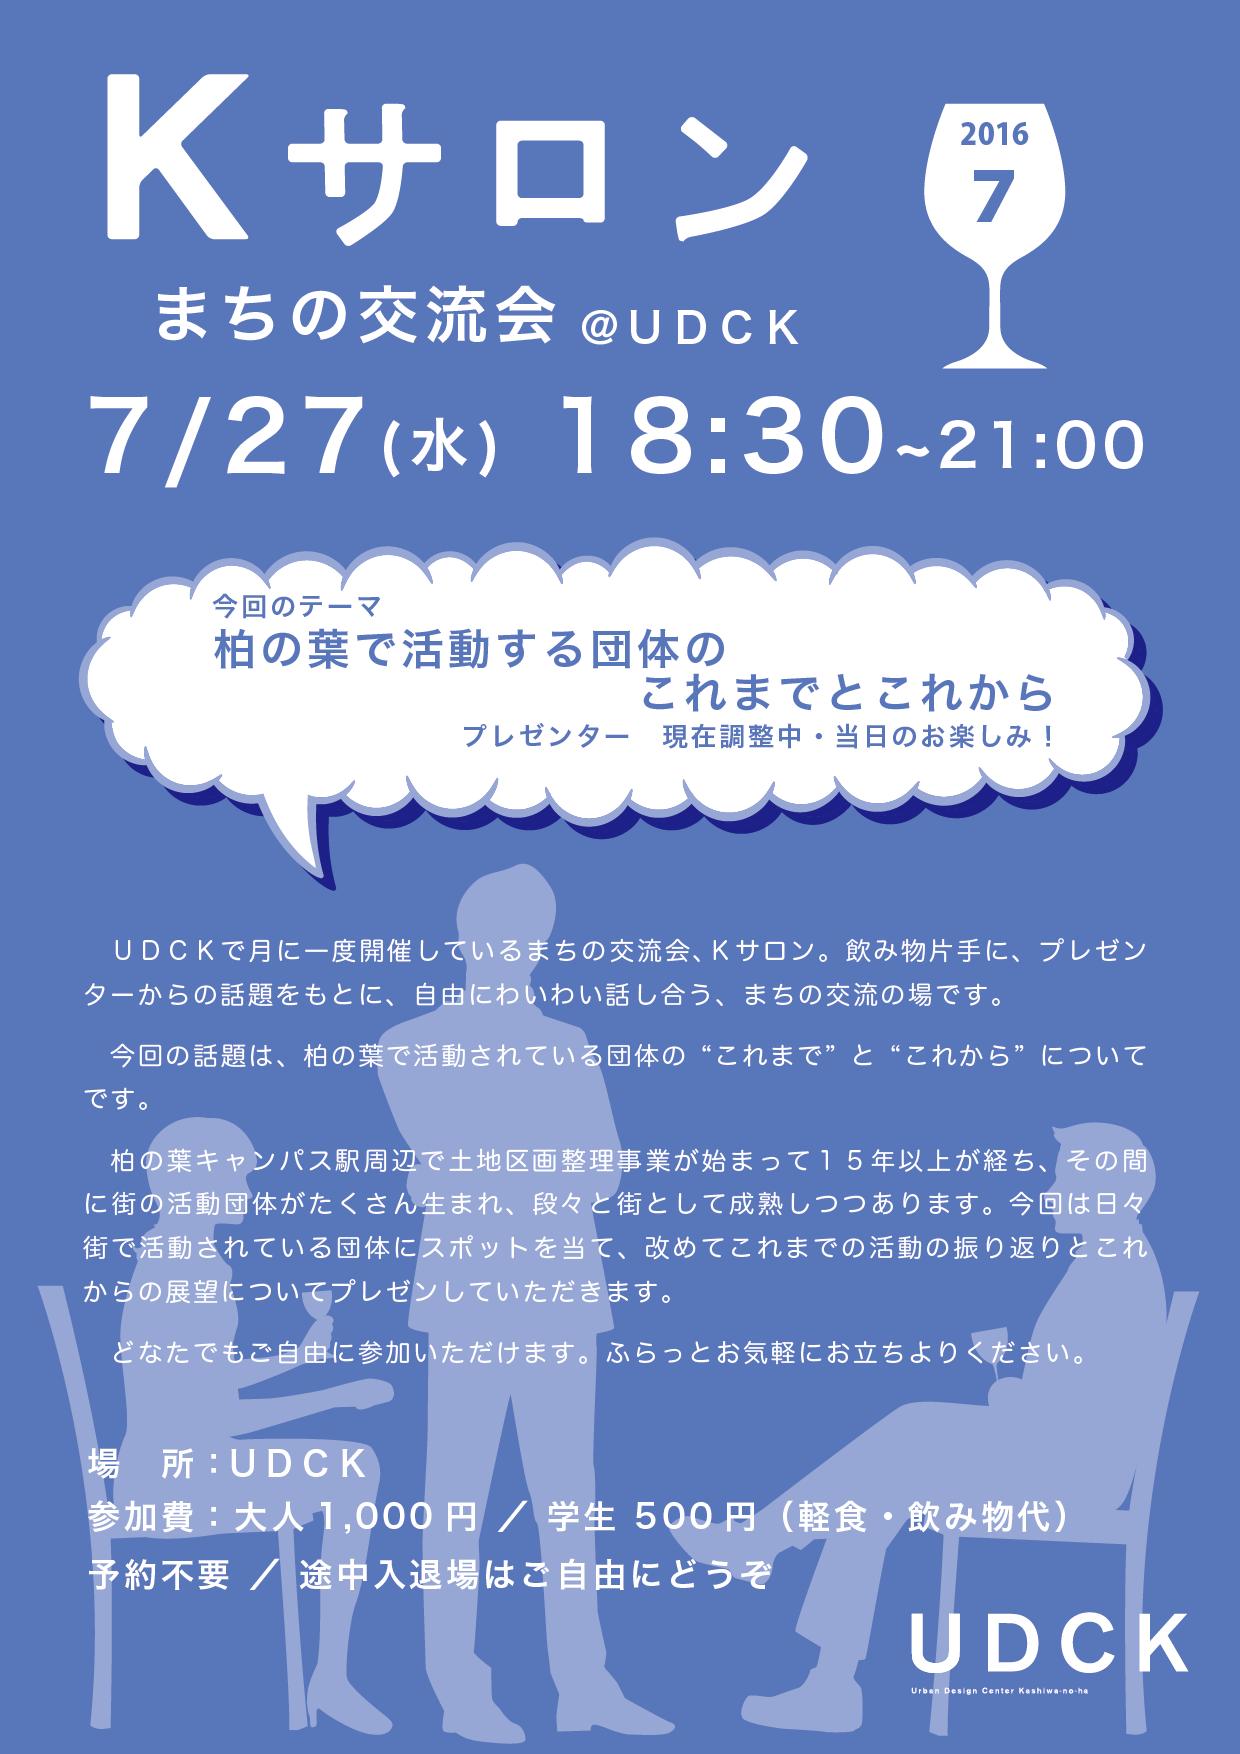 http://www.udck.jp/event/2016_7_Ksalon.png